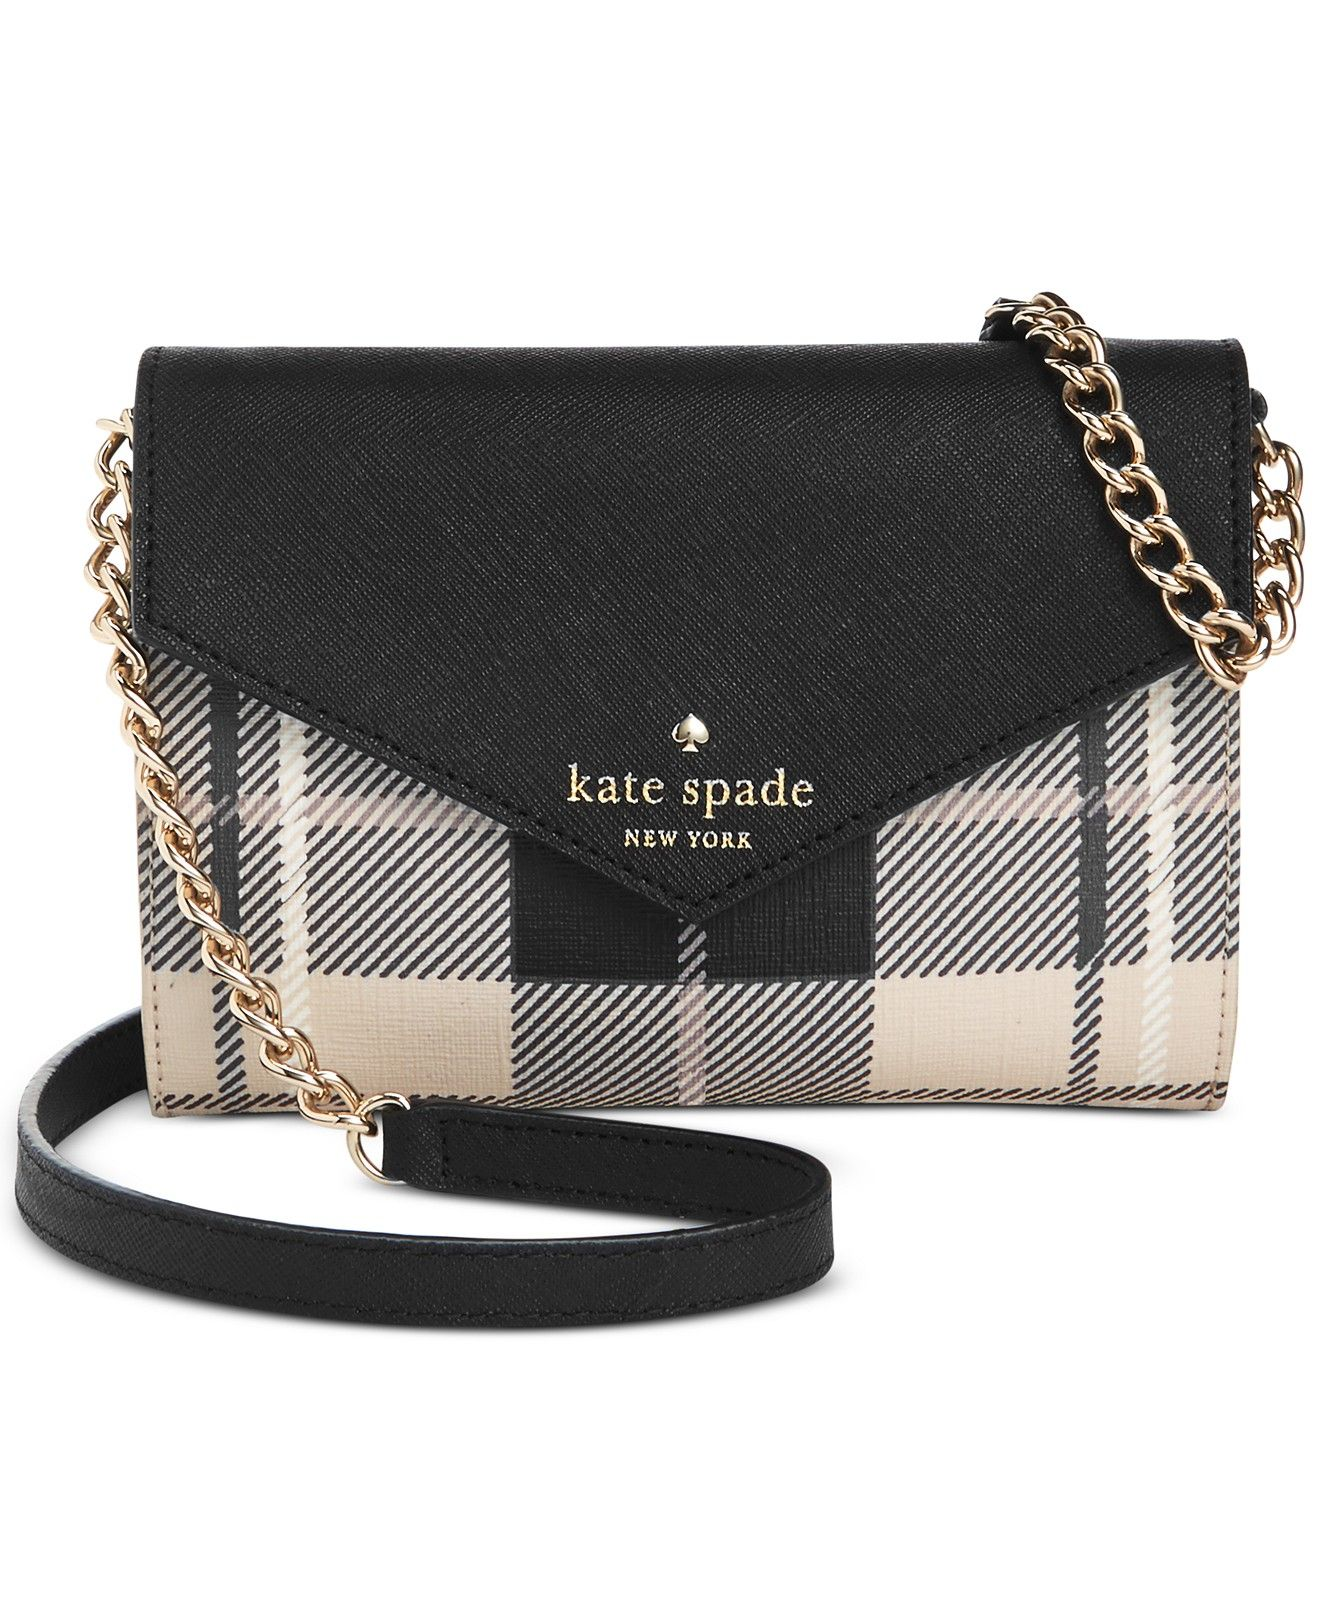 Kate Spade New York Fairmount Square Monday Crossbody Messenger Bags Handbags Accessories Macys Women S Wallets